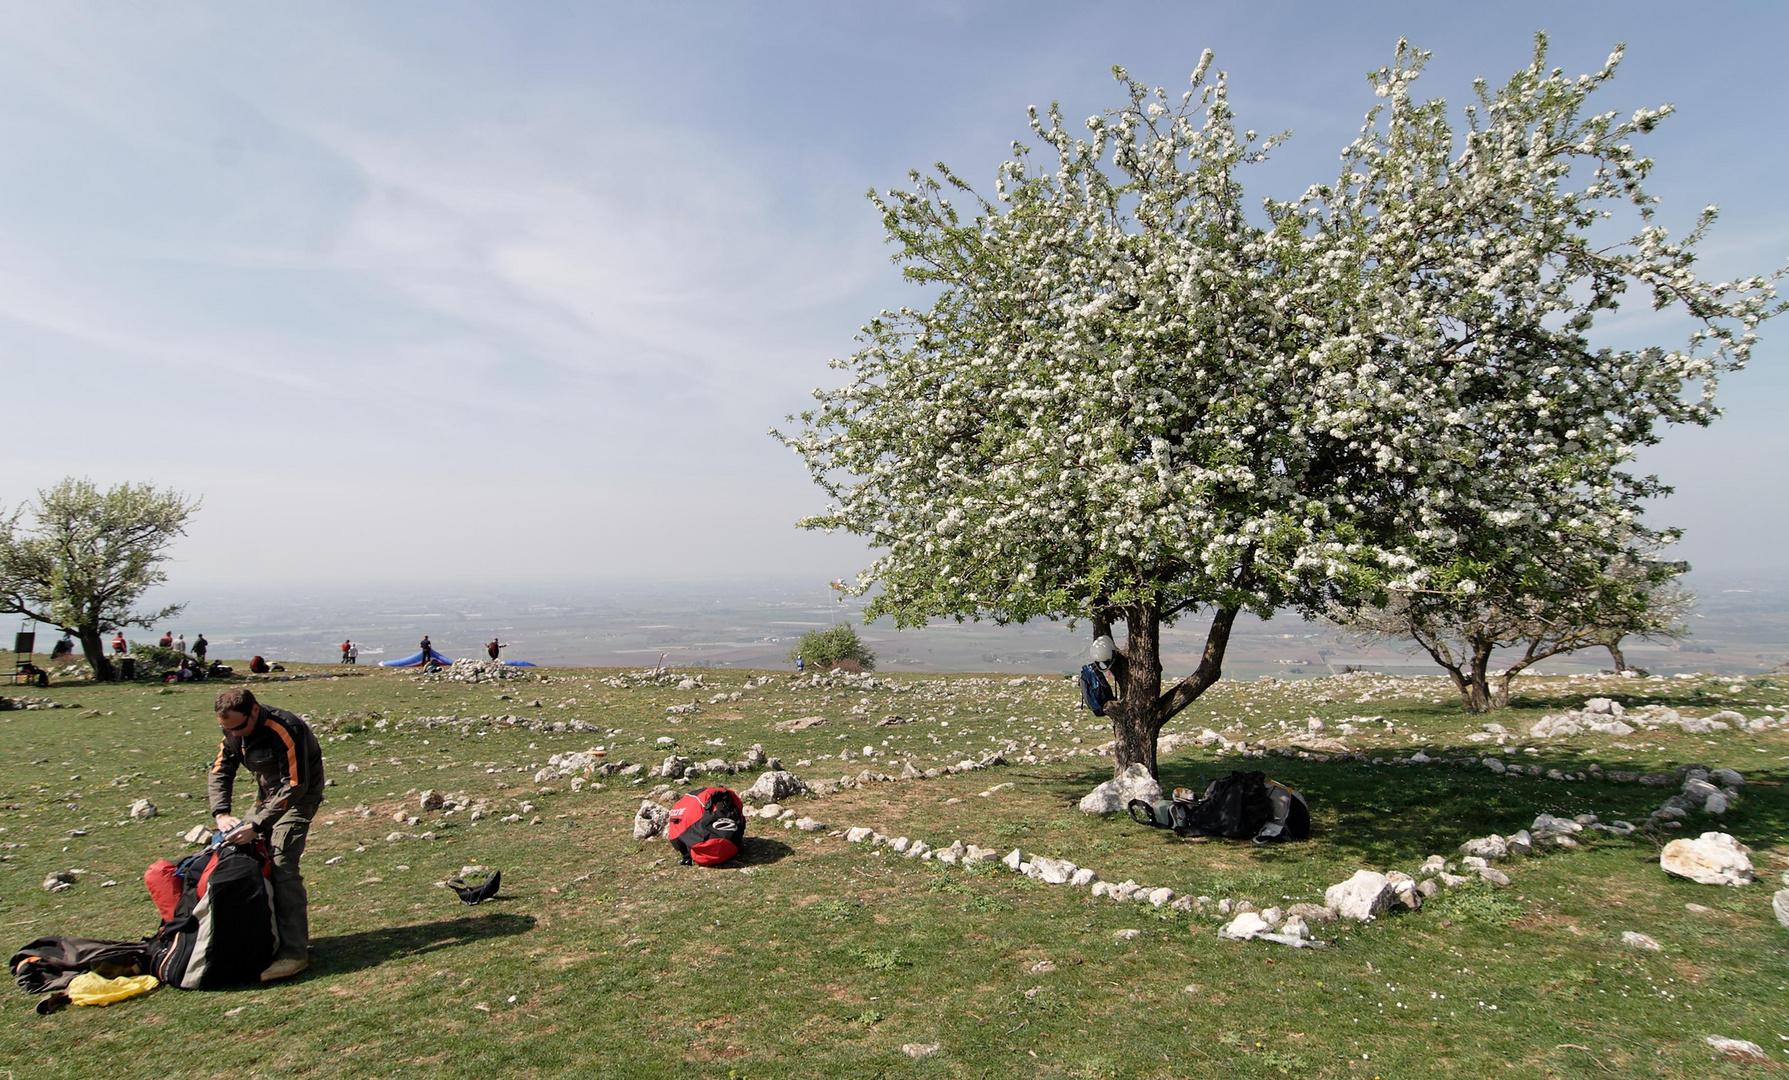 Apfelbaumblüte in Norba